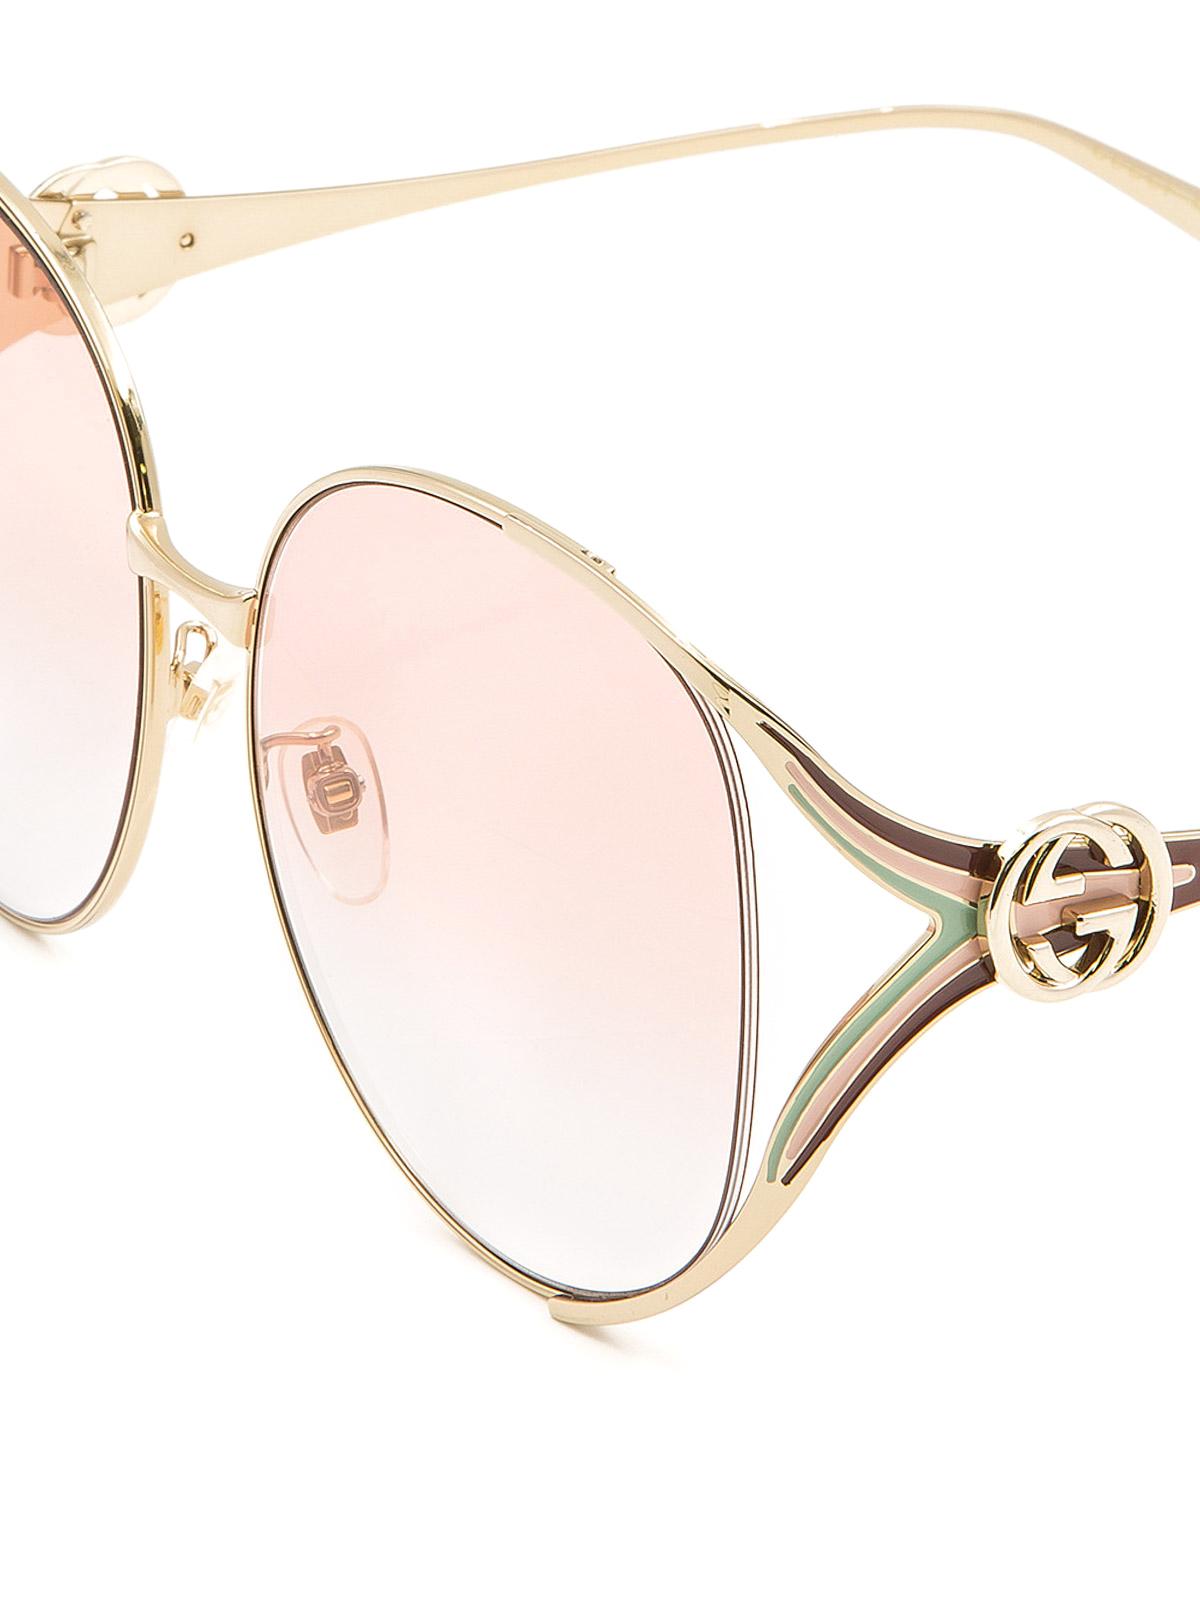 718c41cca7c7 Gucci - Round slim metal frame sunglasses - sunglasses - GG0225S5